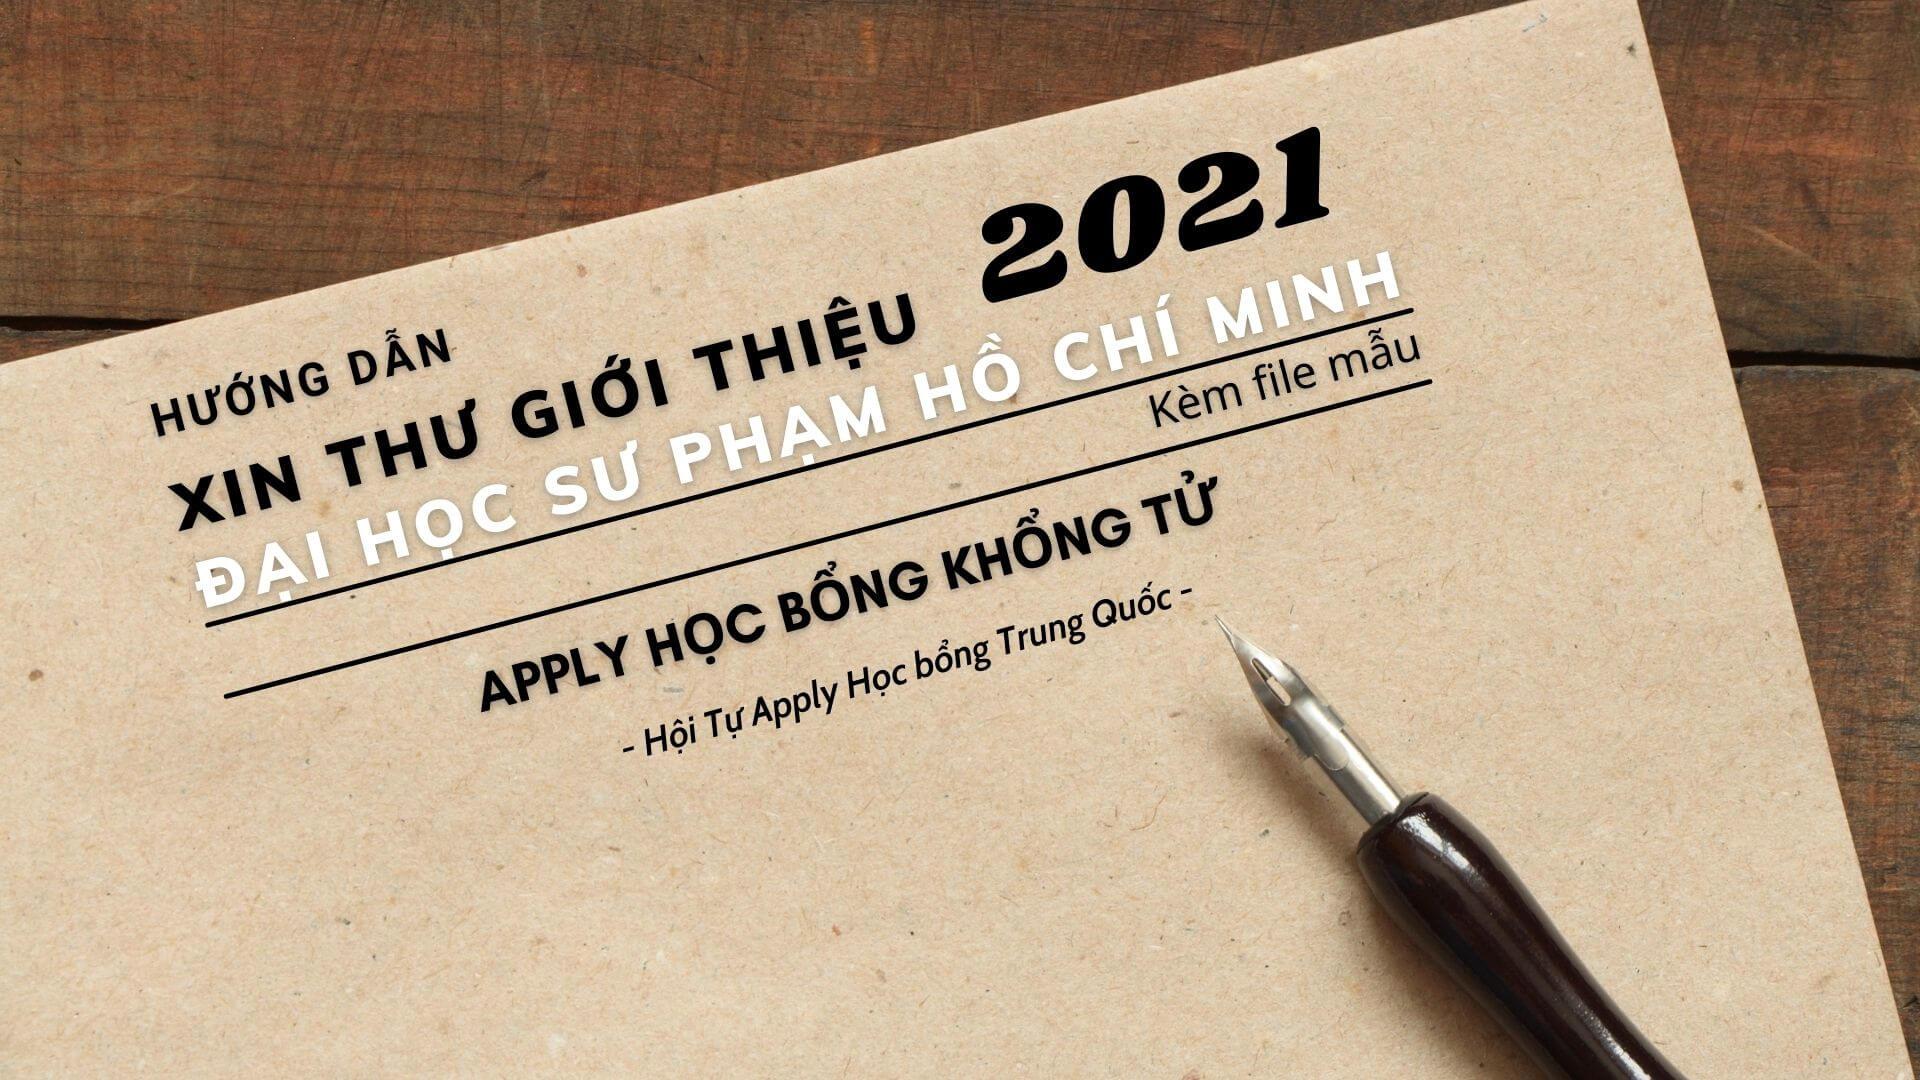 Huong Dan Xin Thu Gioi Thieu Dai Hoc Su Pham Ho Chi Minh 2021 2021